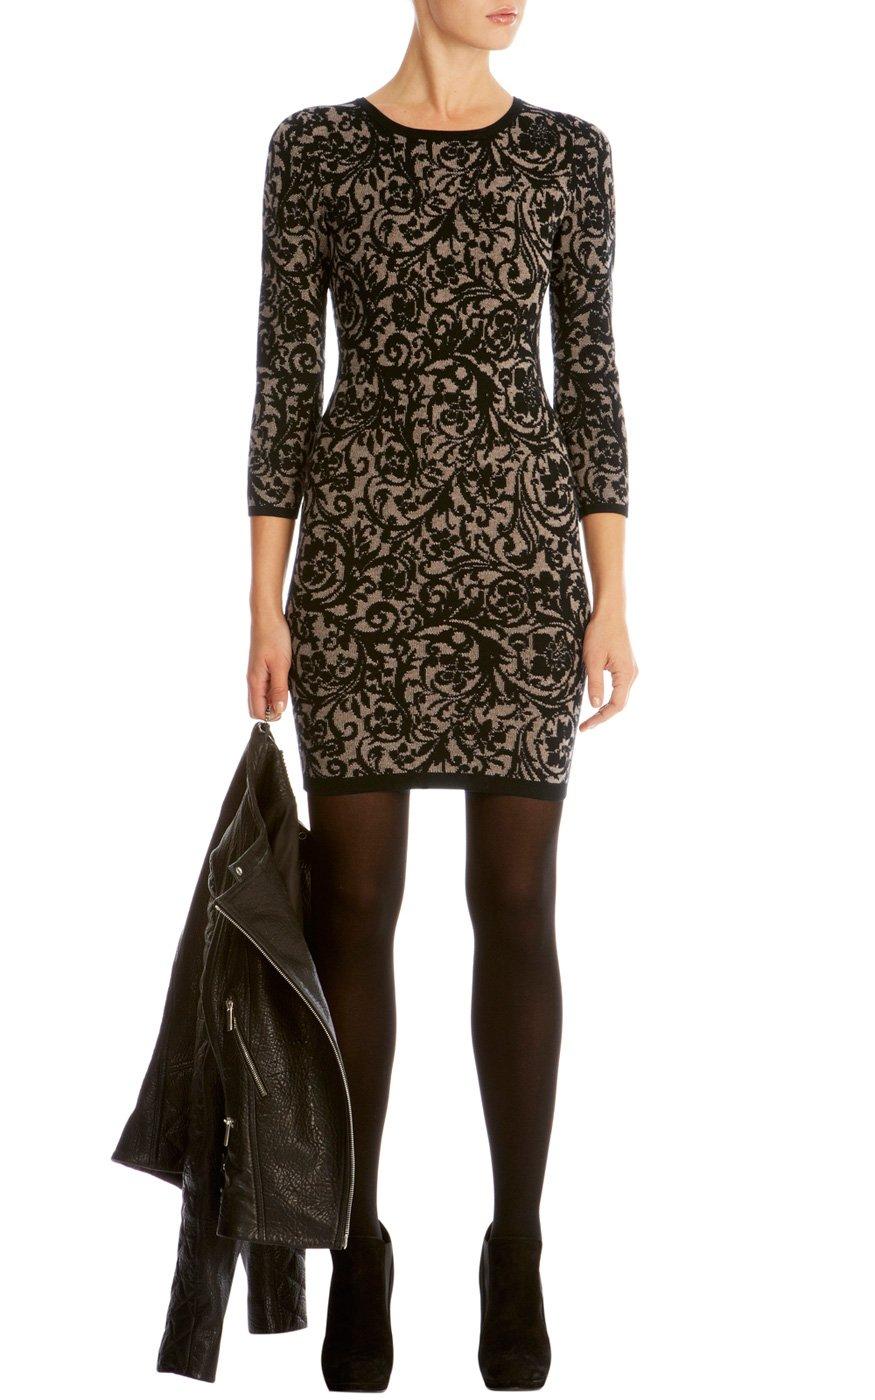 Lyst Karen Millen Brocade Jacquard Knit Dress In Black